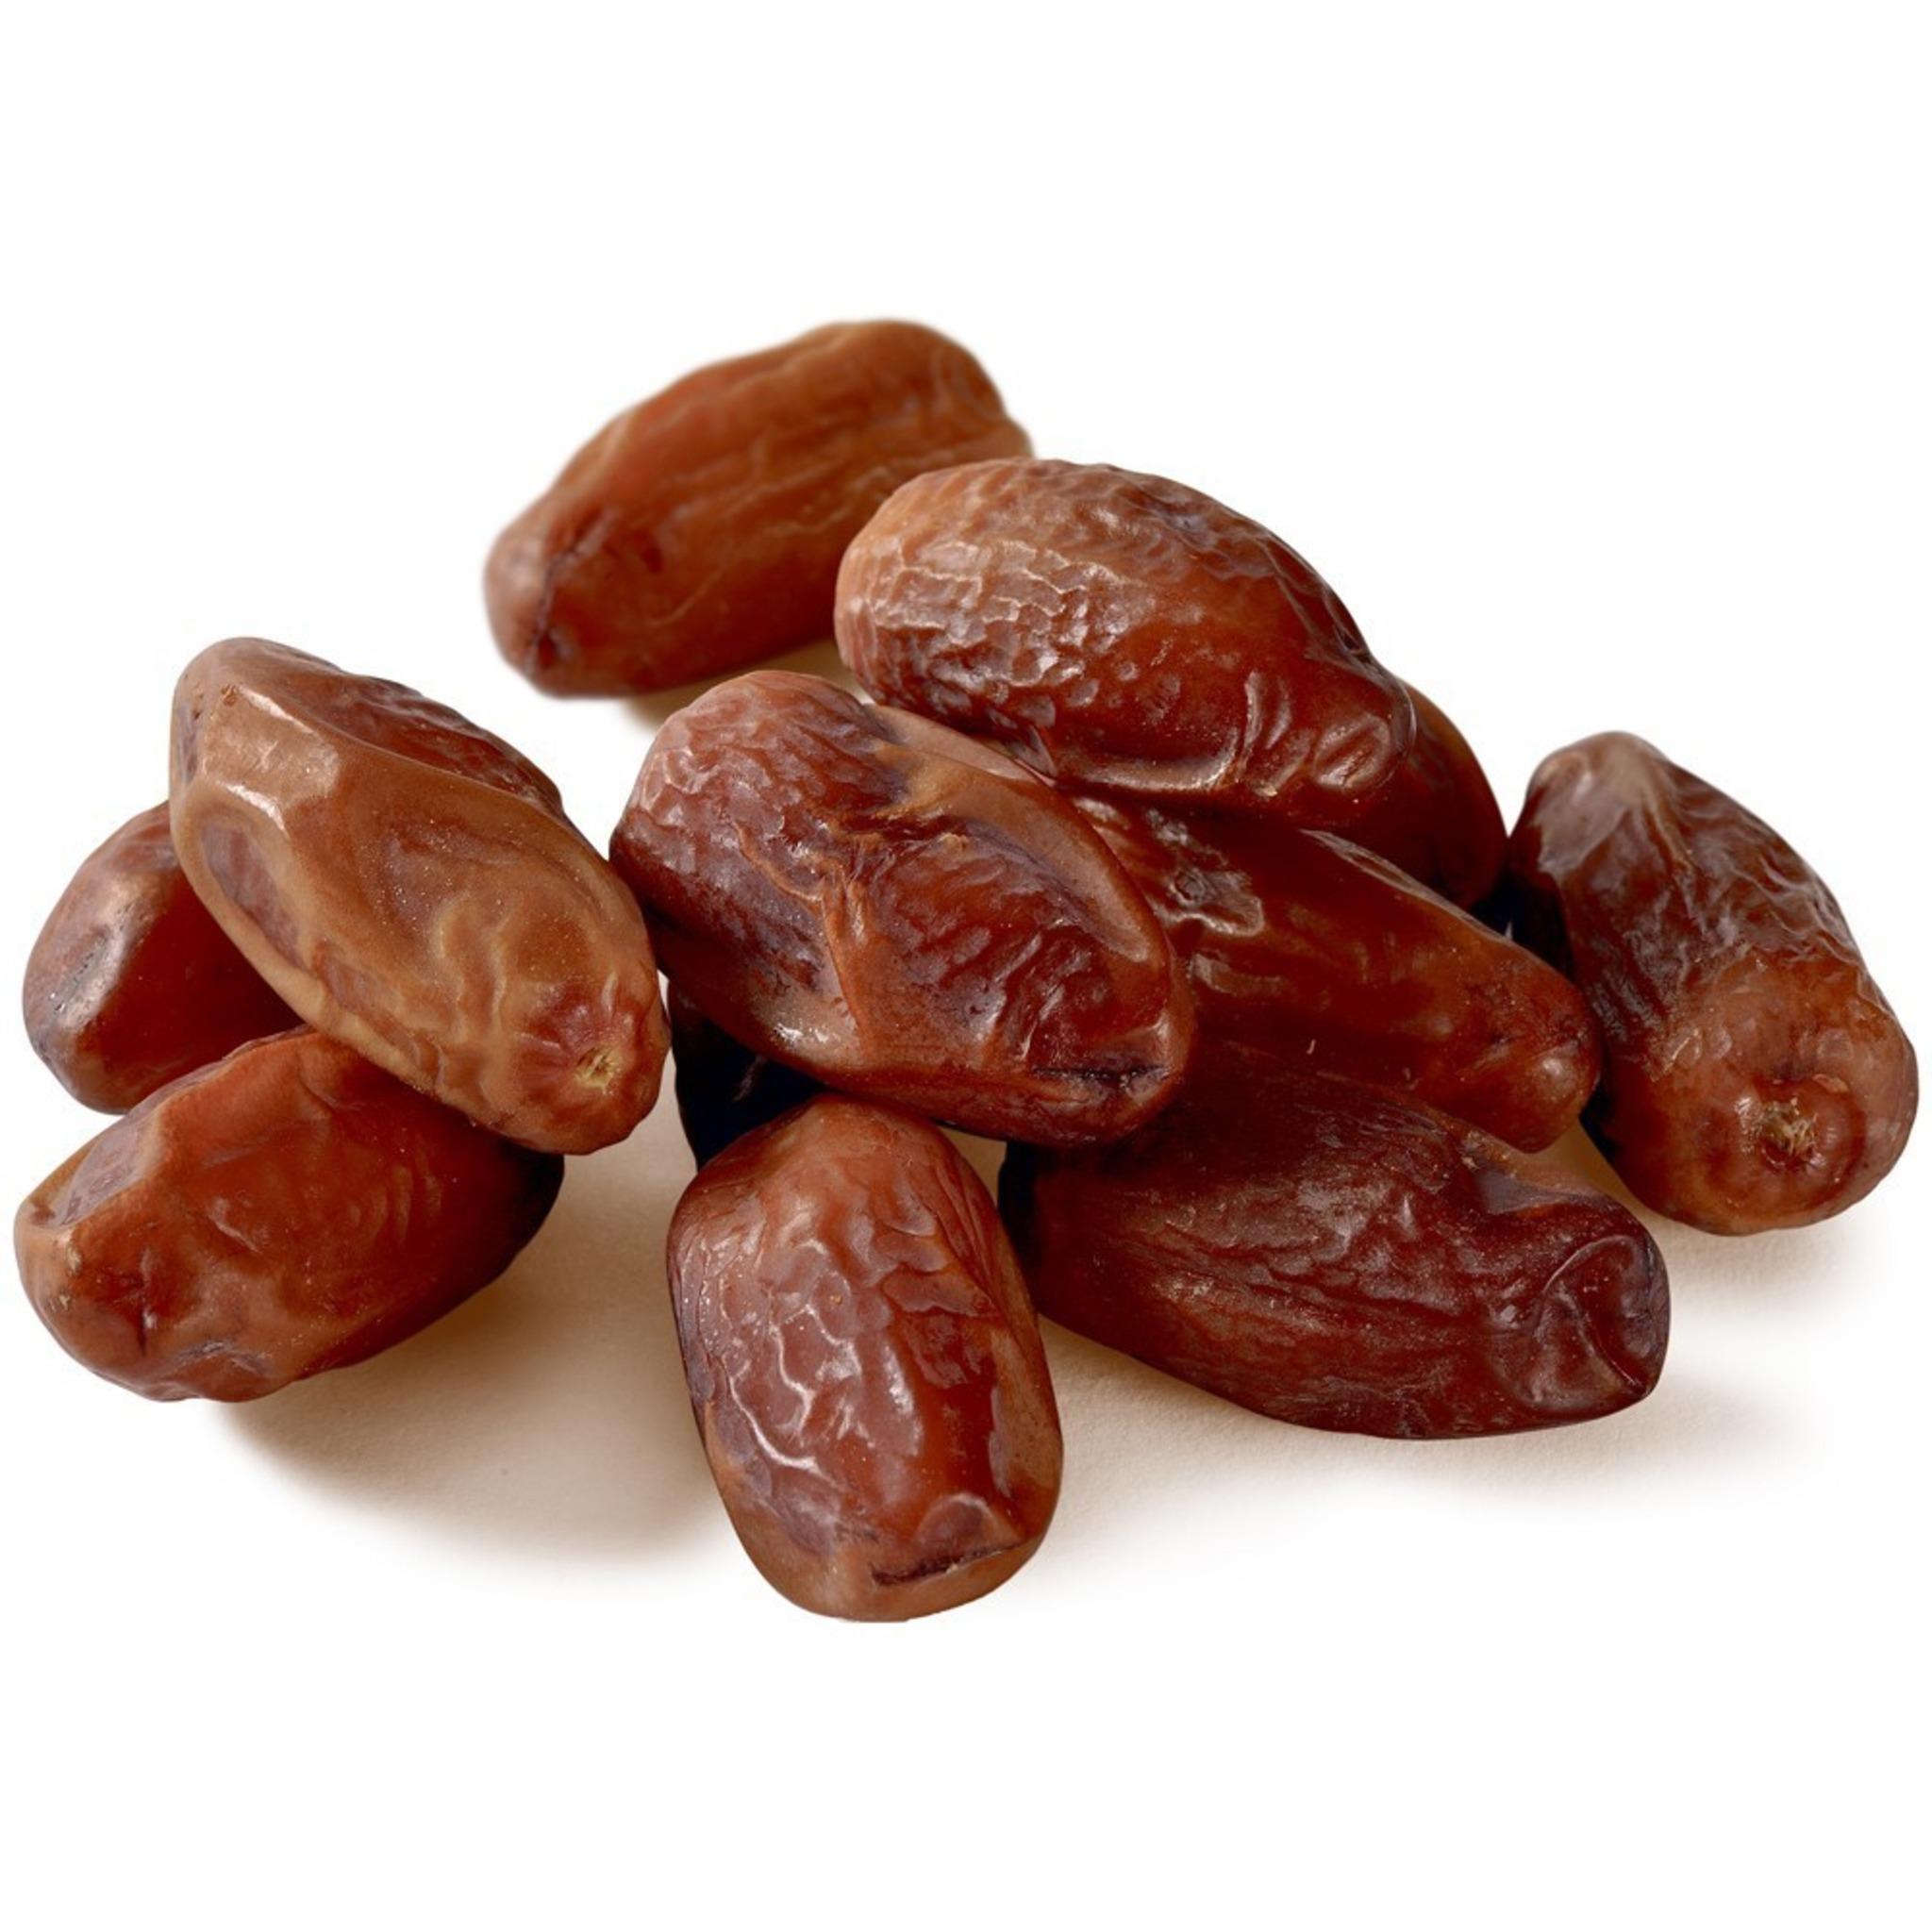 Vorau single night Auen dating berry